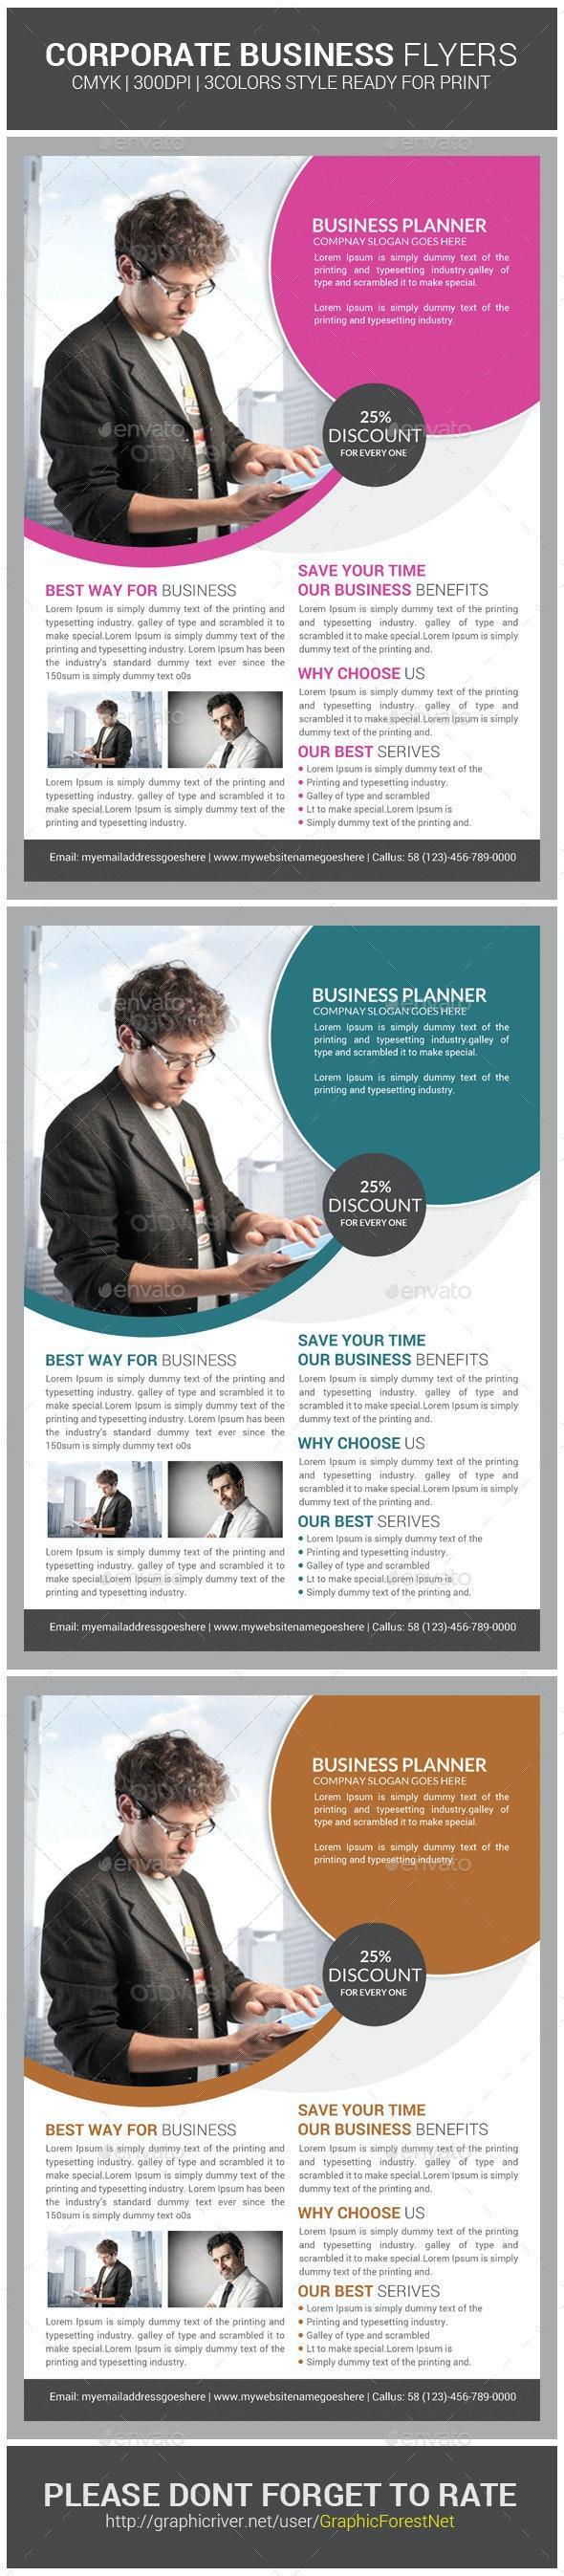 Creative Corporate Business Flyer Psd Template - Corporate Flyers